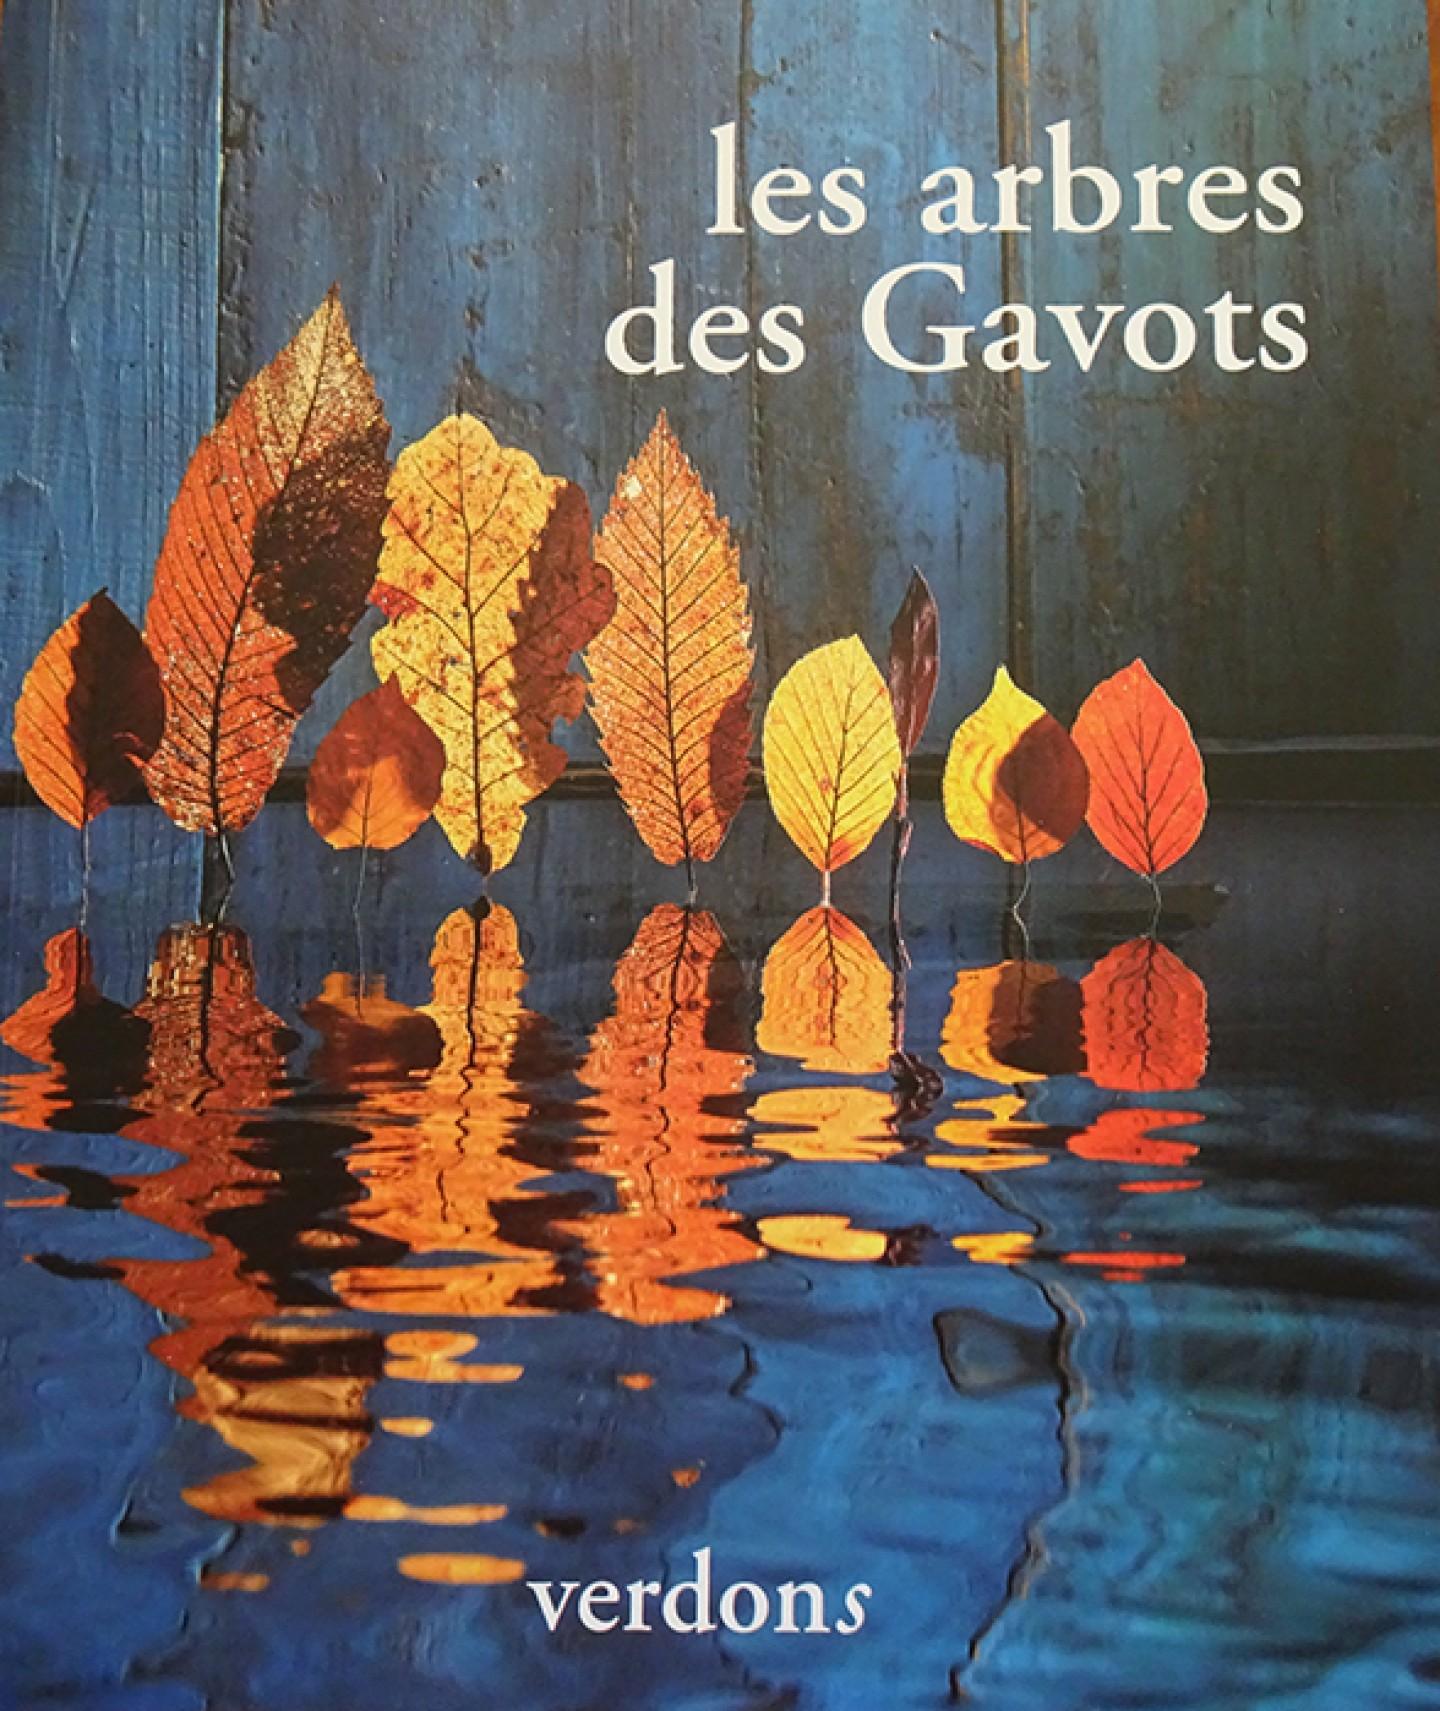 Revue verdons n° 61 : les arbres des Gavots